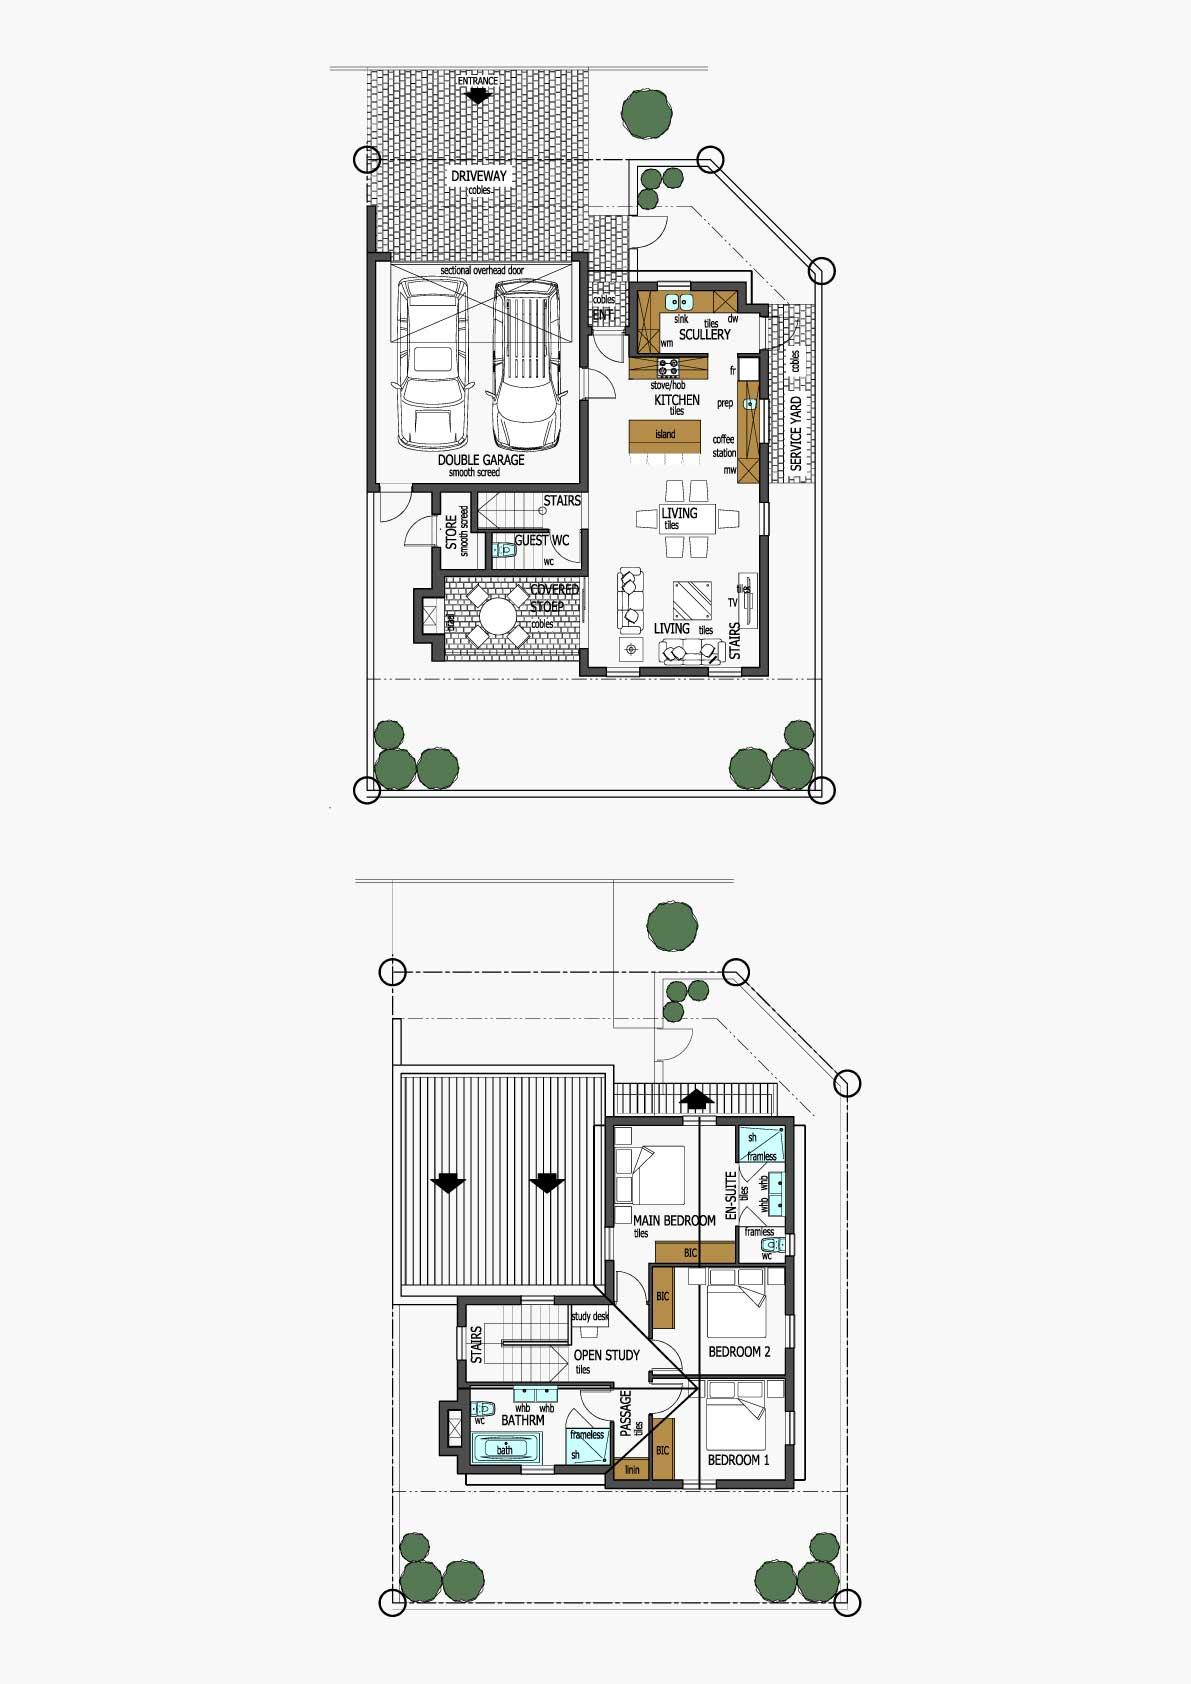 Homes Unit Layout - Type E